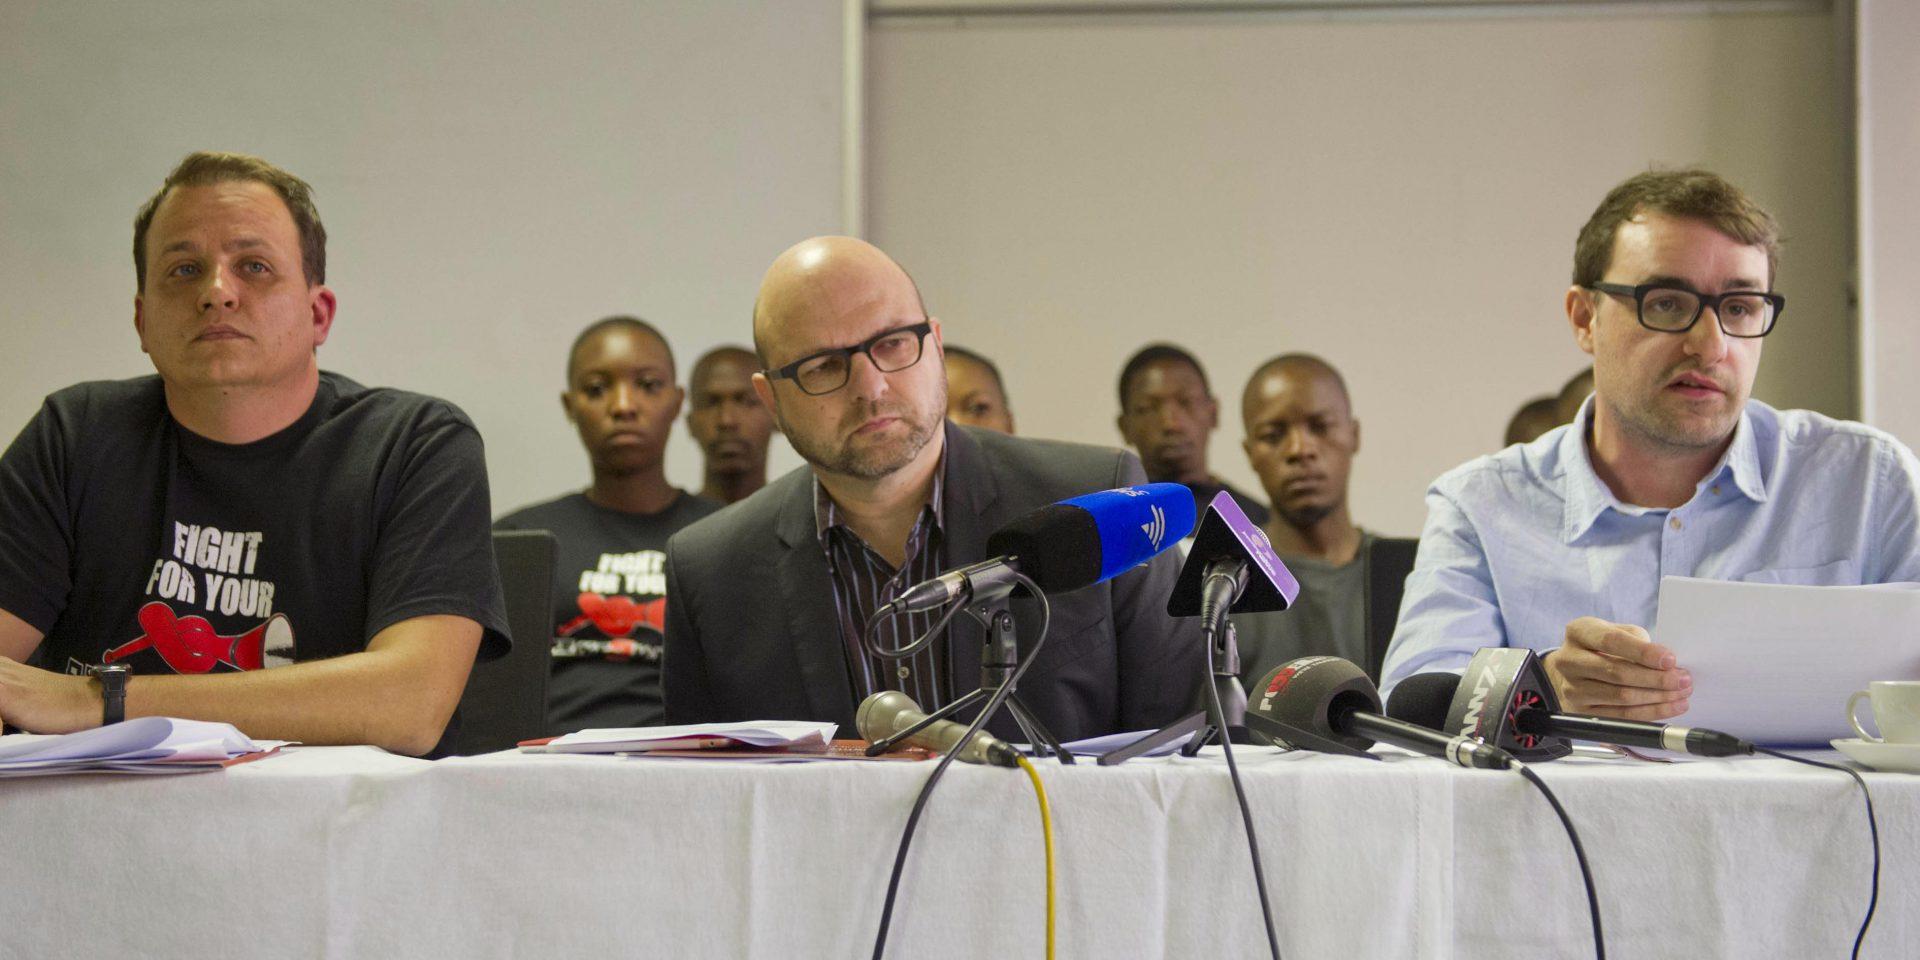 28 August 2014: (From left) Former arms deal critics Hennie van Vuuren, Andrew Feinstein and Paul Holden, in Pretoria. (Photograph by Gallo Images/Foto24/Craig Niewenhuizen)